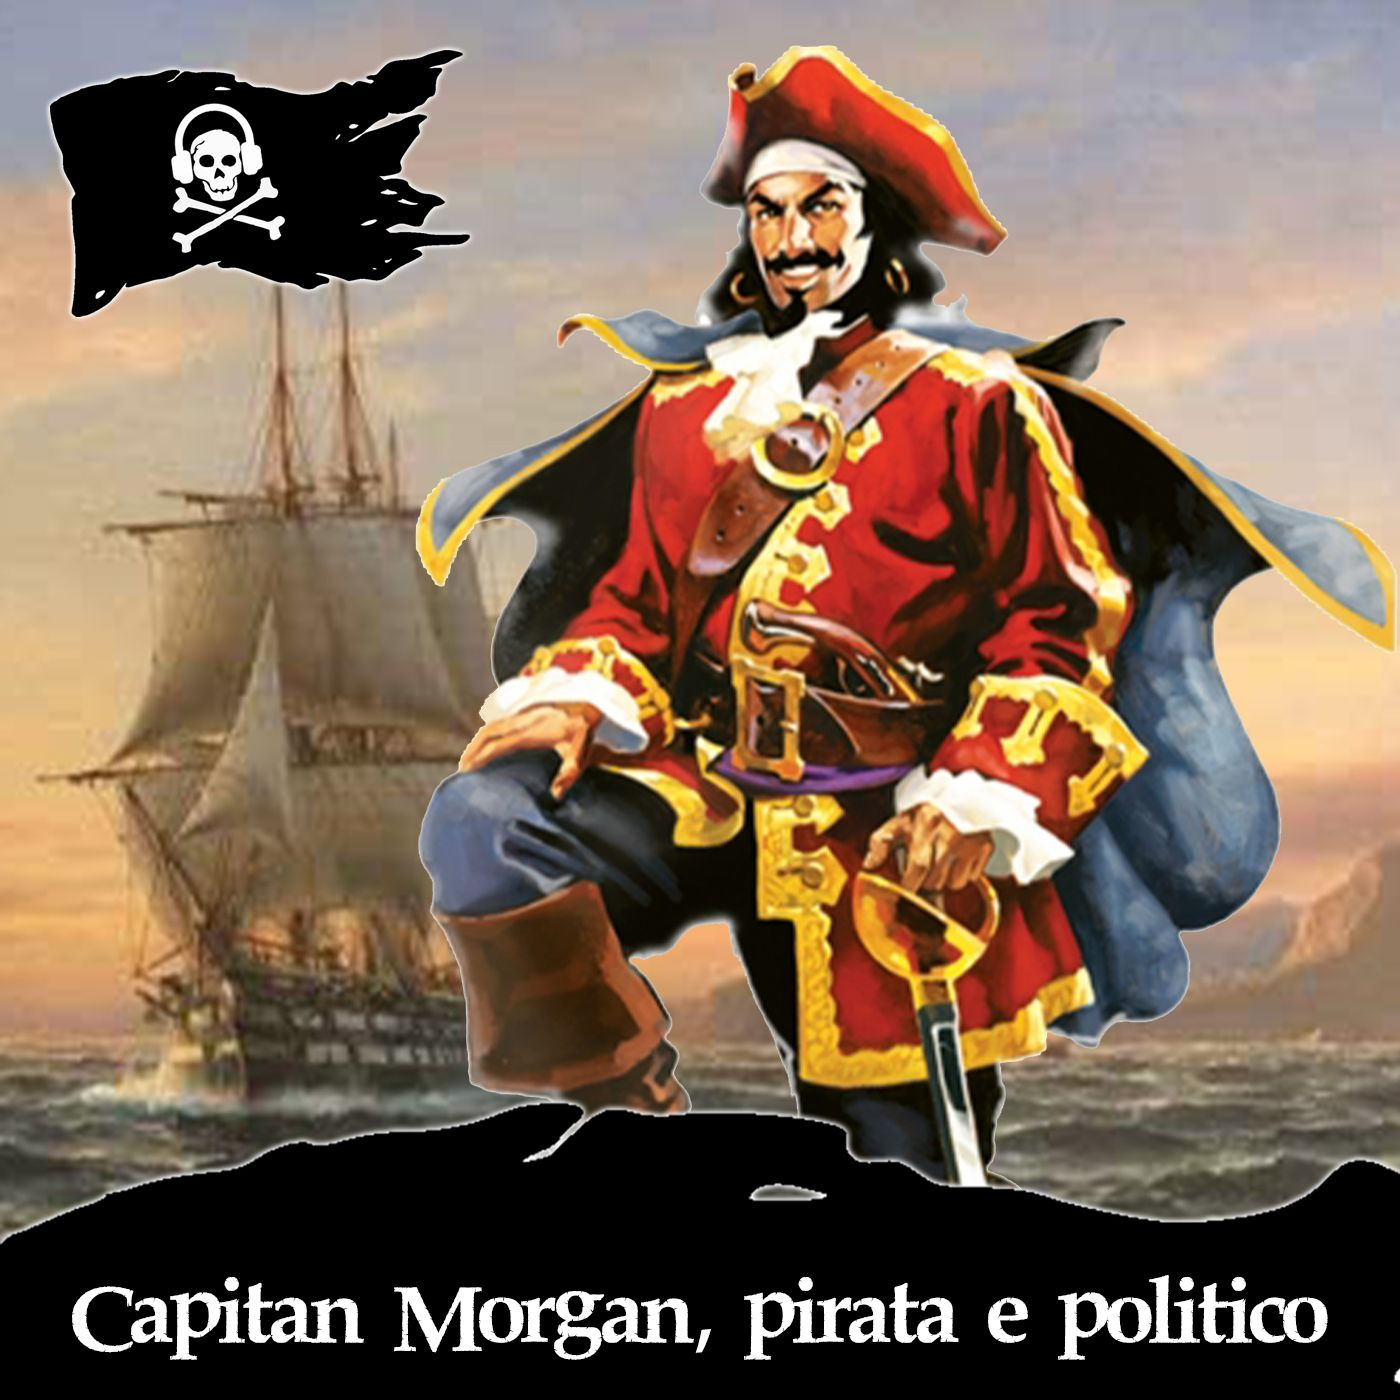 49 - Capitan Morgan, pirata e politico